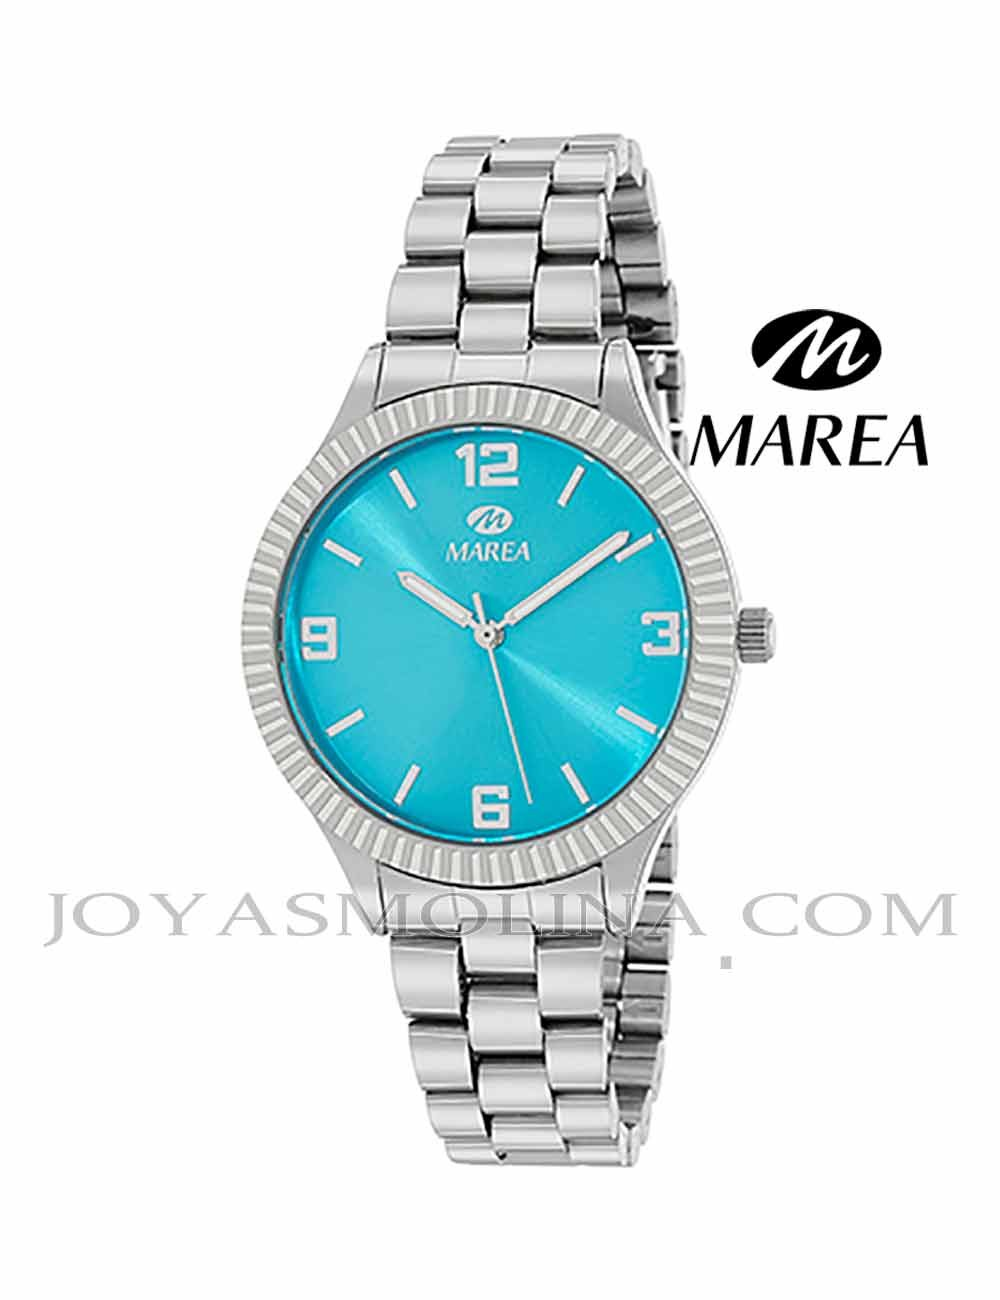 Reloj Marea mujer cadena B41254-3 esfera turquesa